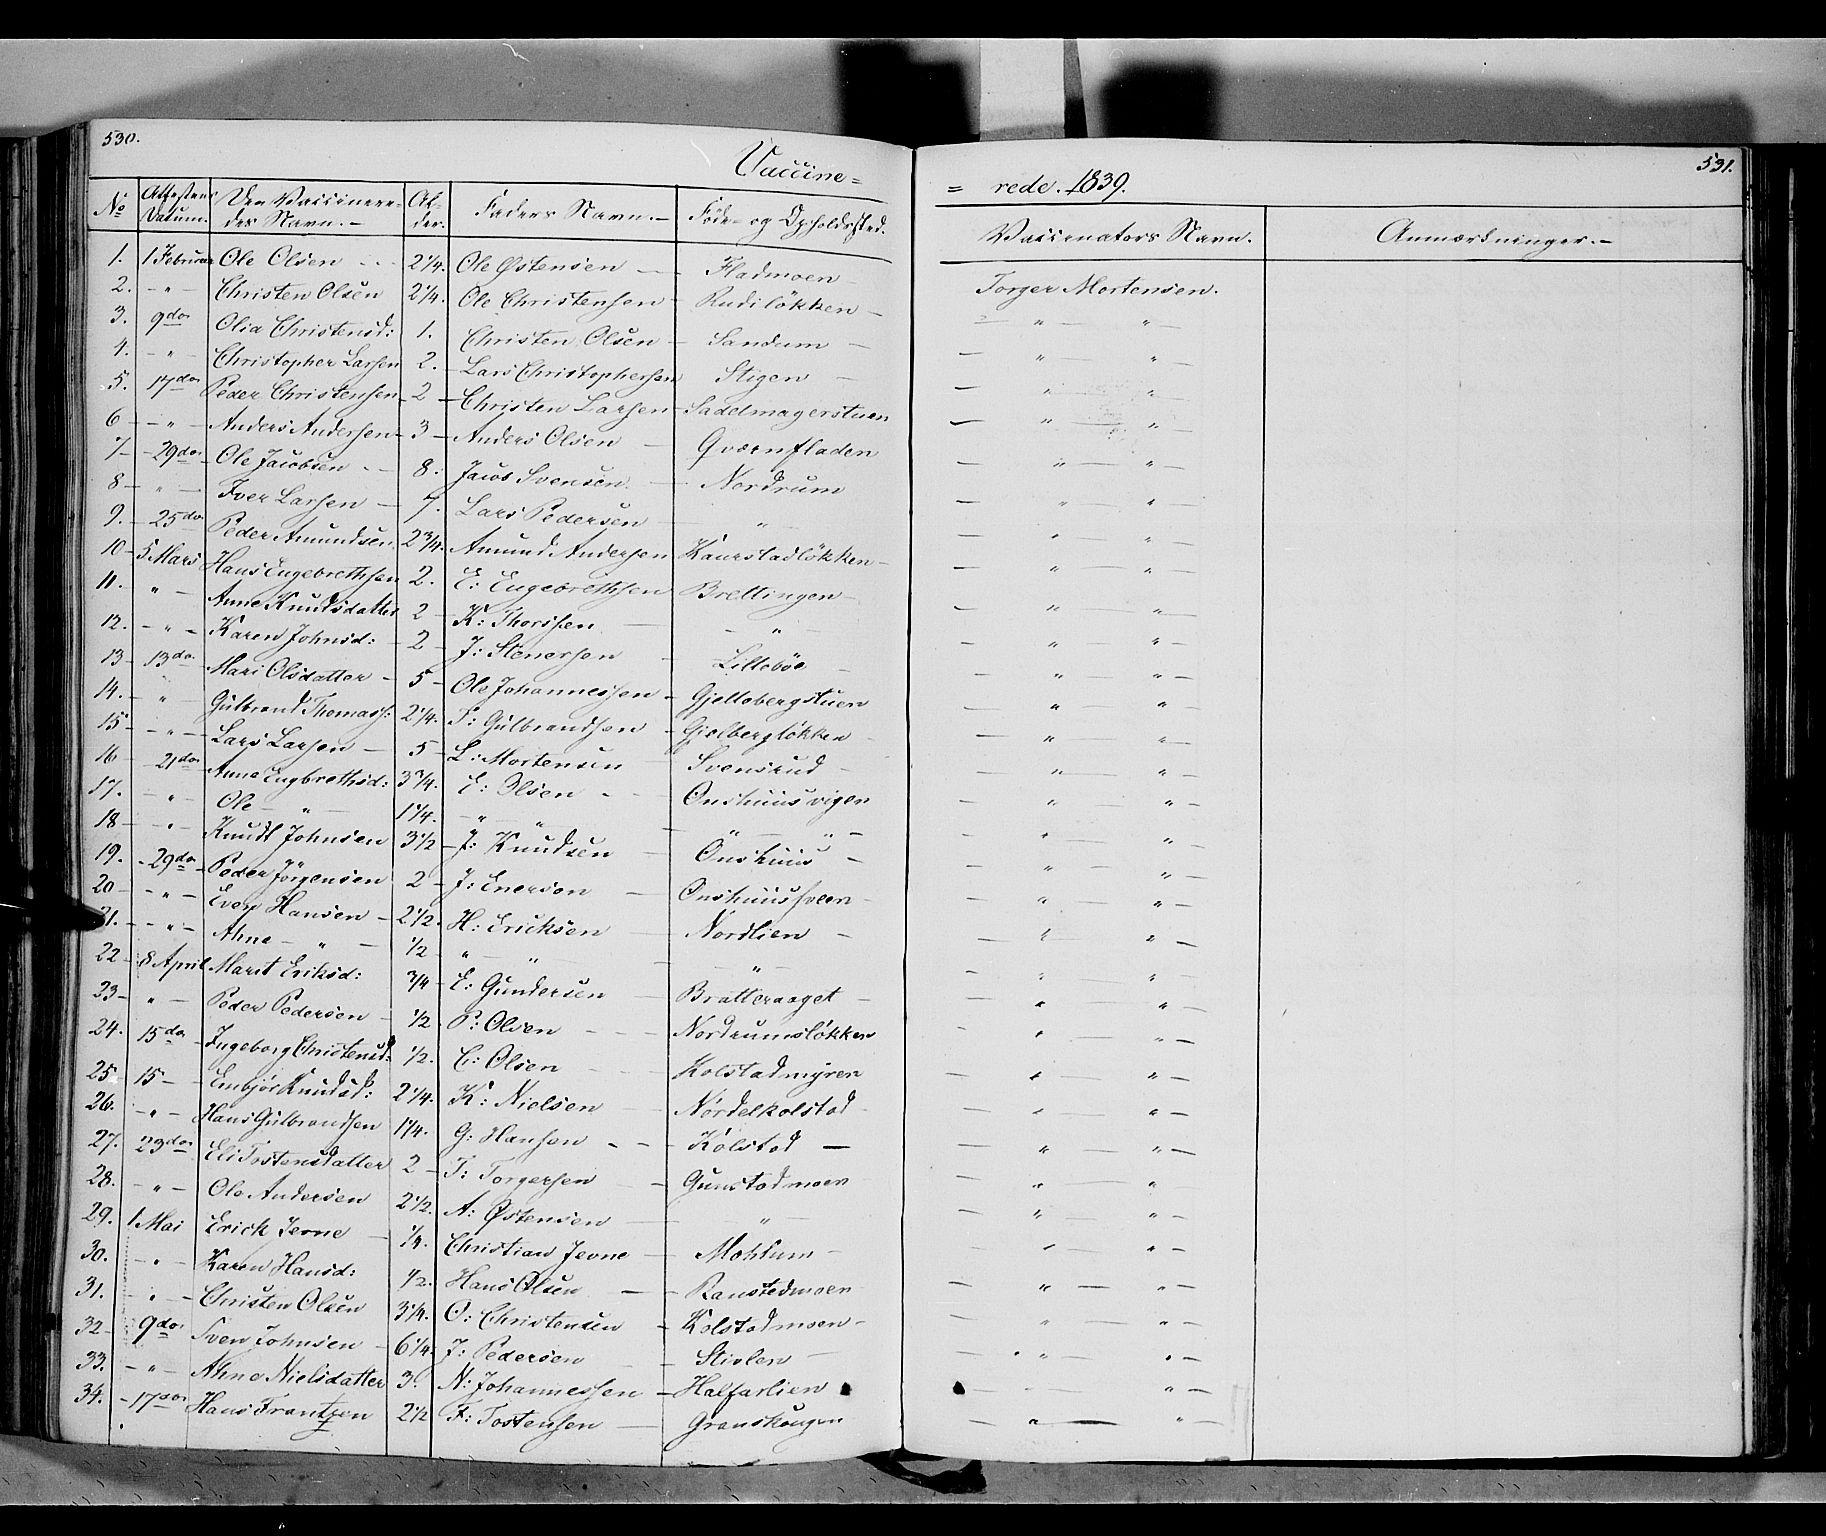 SAH, Ringebu prestekontor, Ministerialbok nr. 5, 1839-1848, s. 530-531